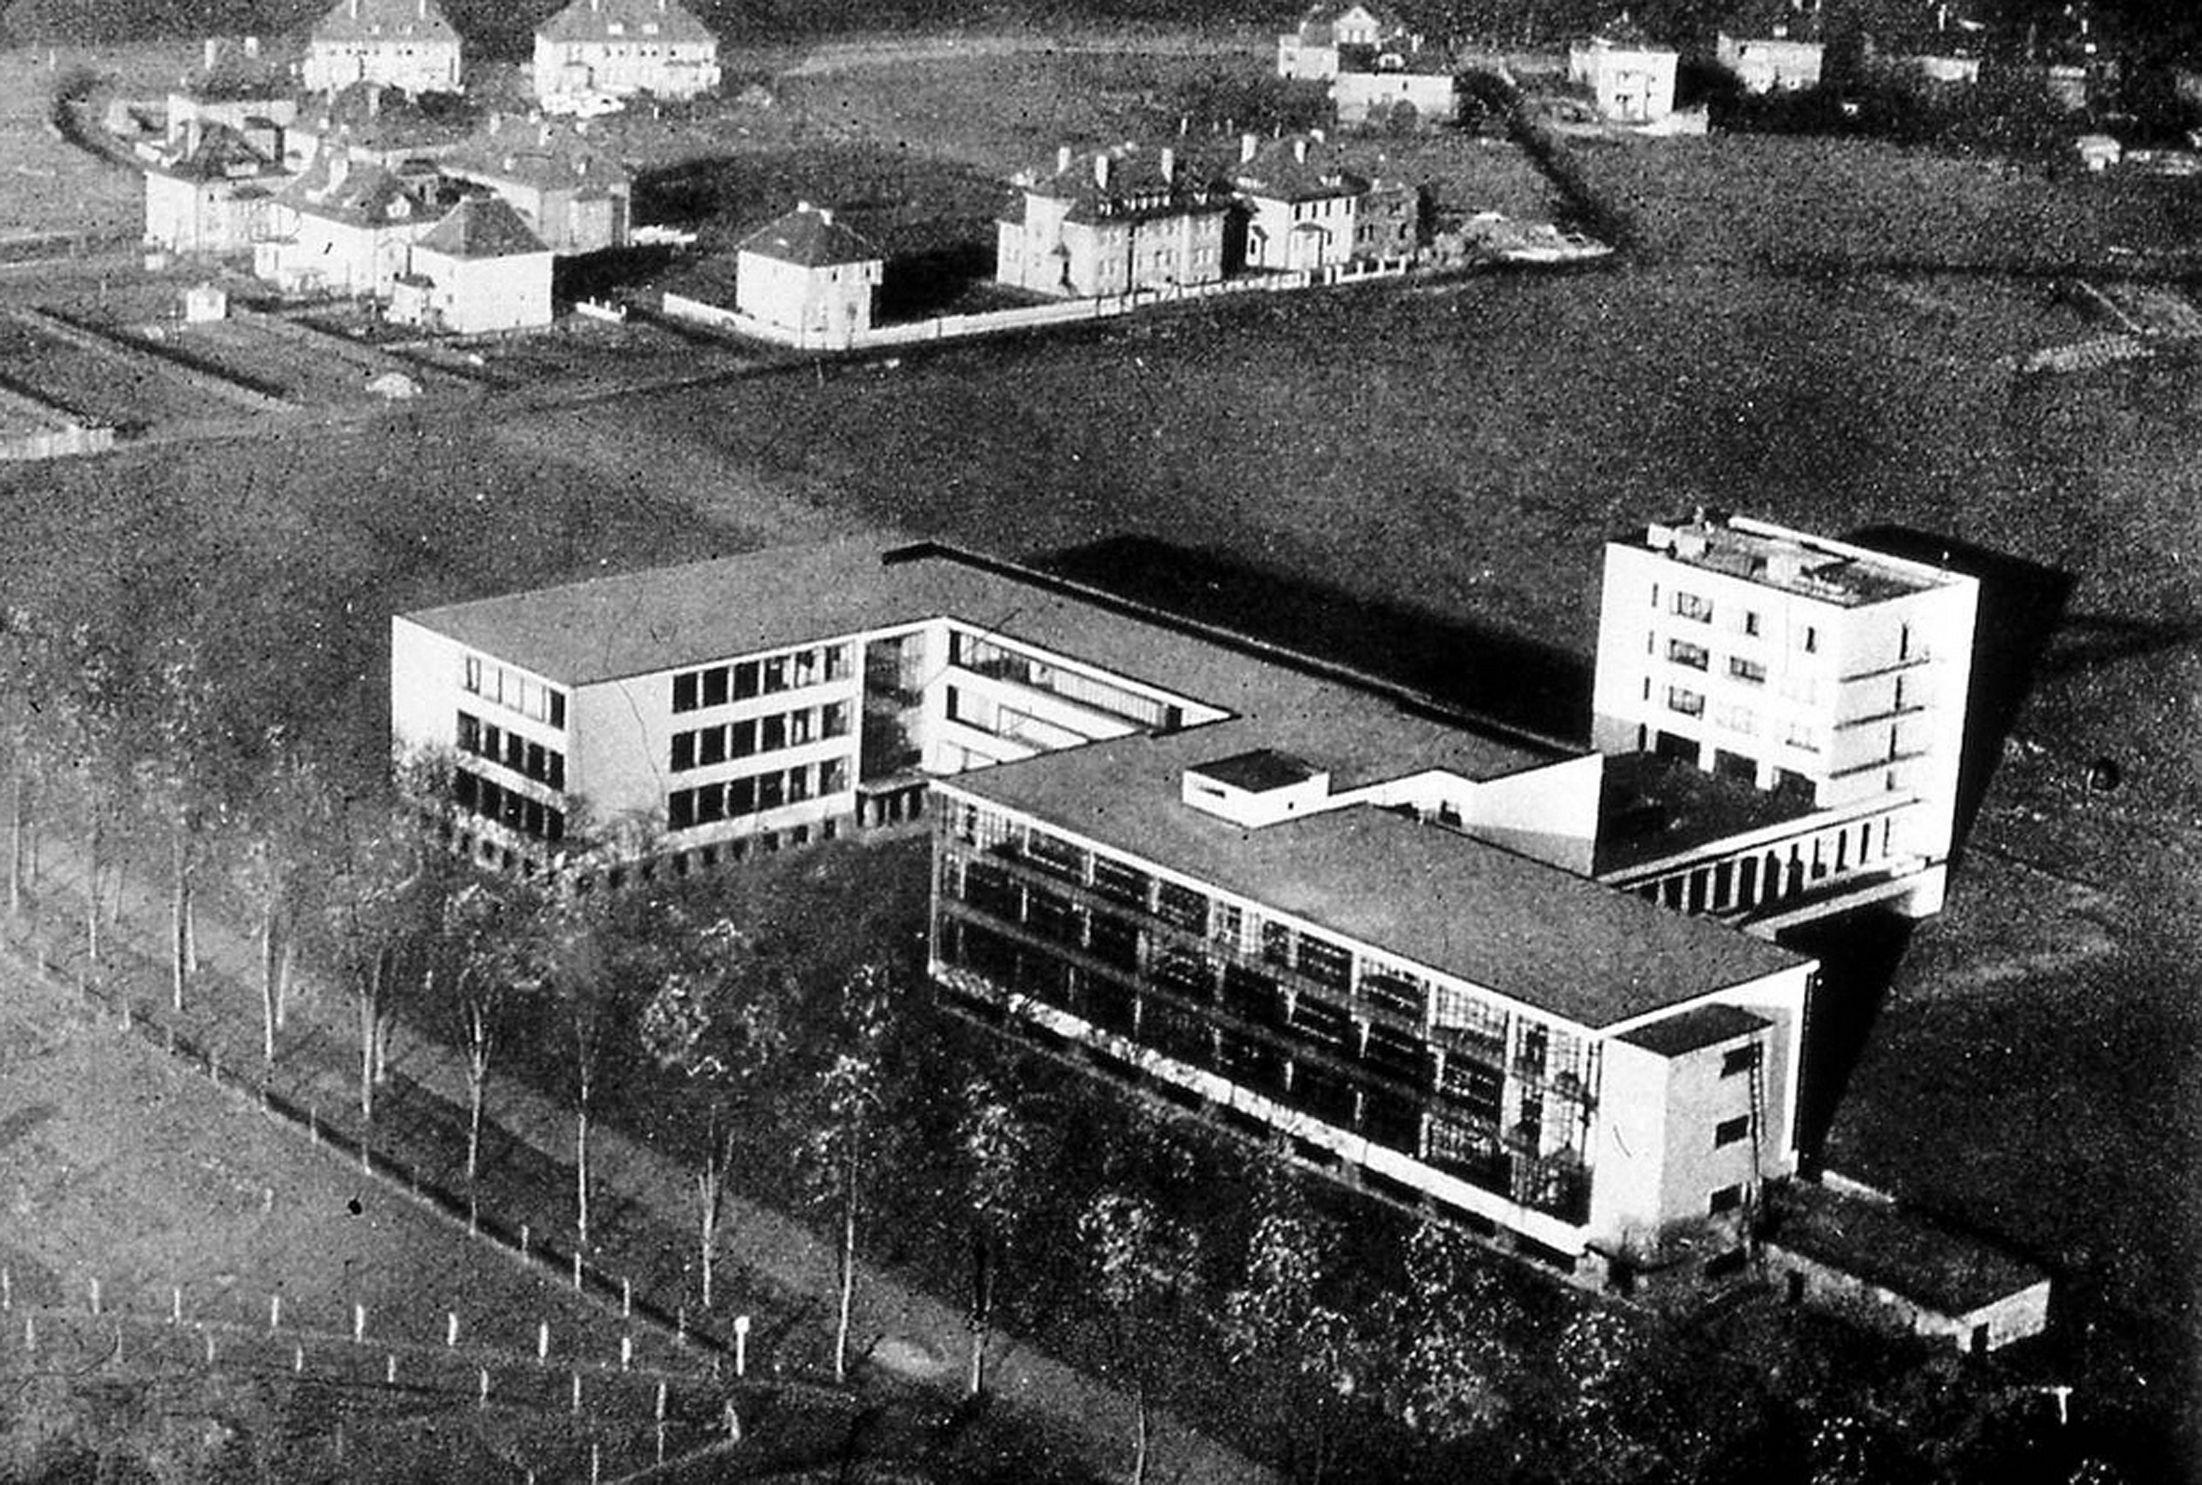 Bauhaus Oranienburg image result for prize gonzalez hinz zabala barcelona spain